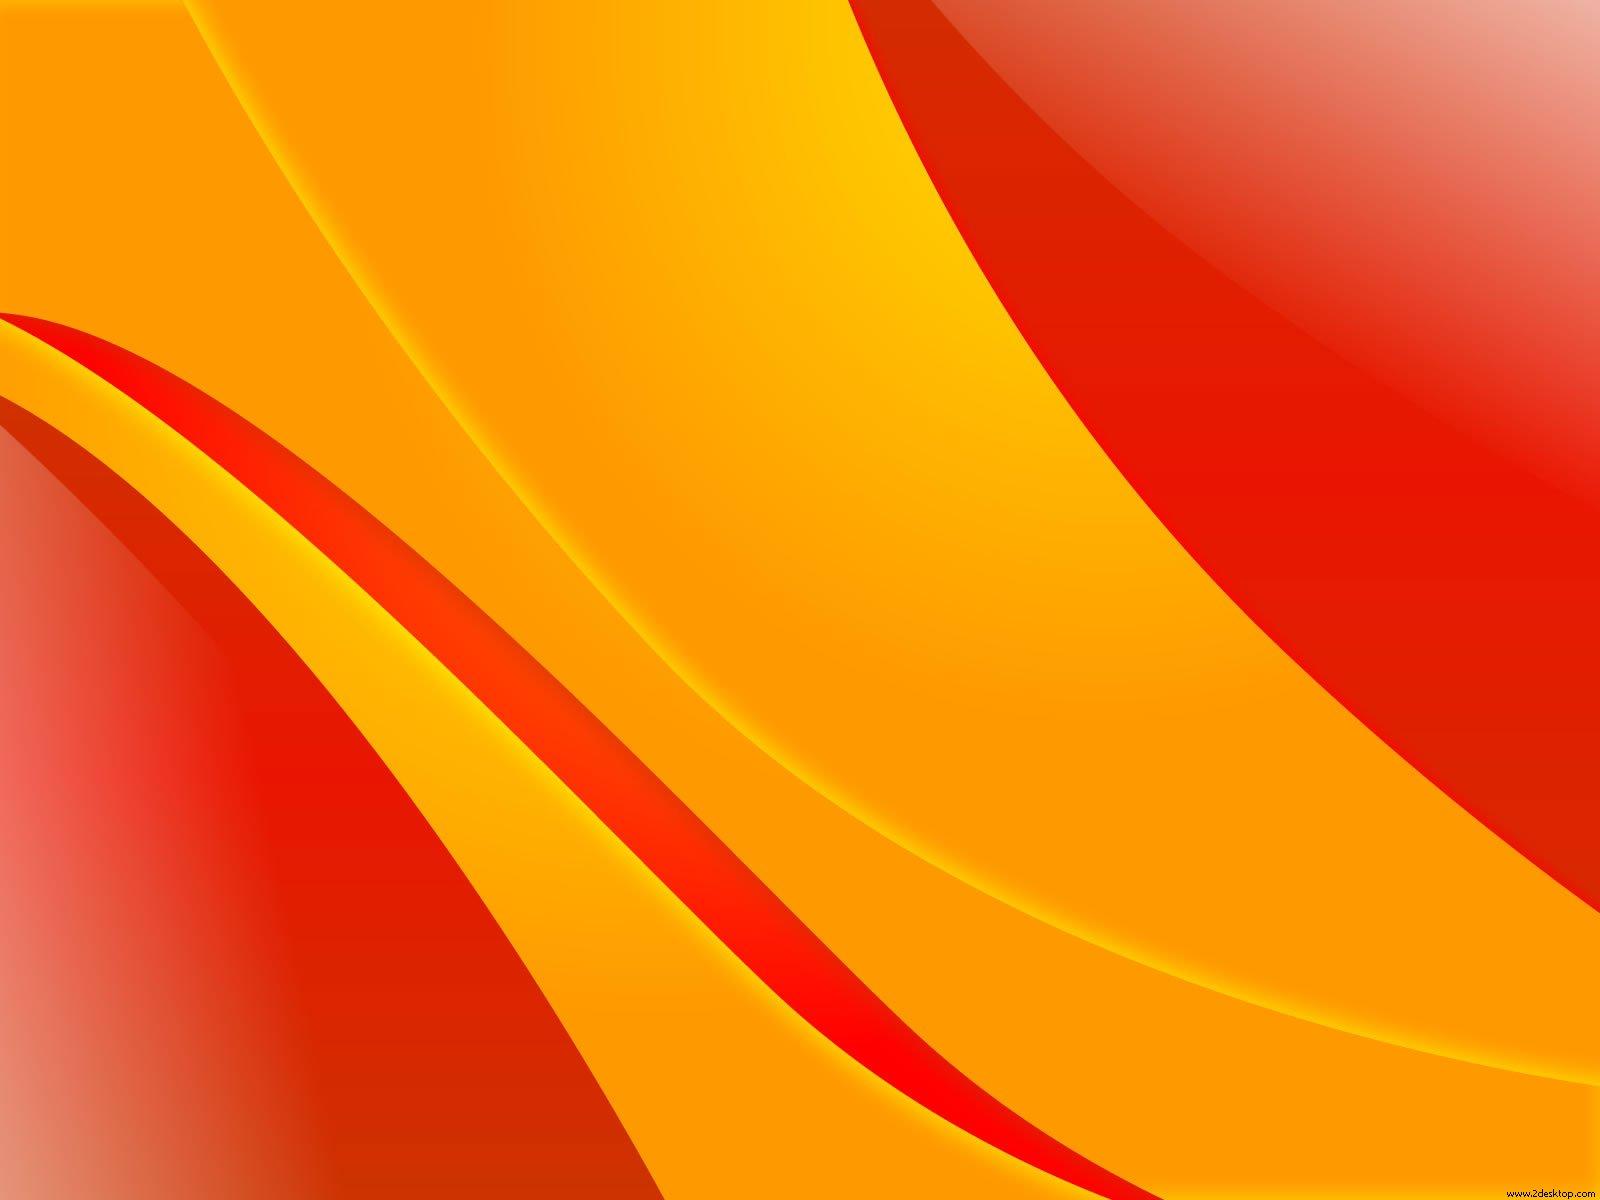 [47+] Yellow and Red Wallpaper on WallpaperSafari